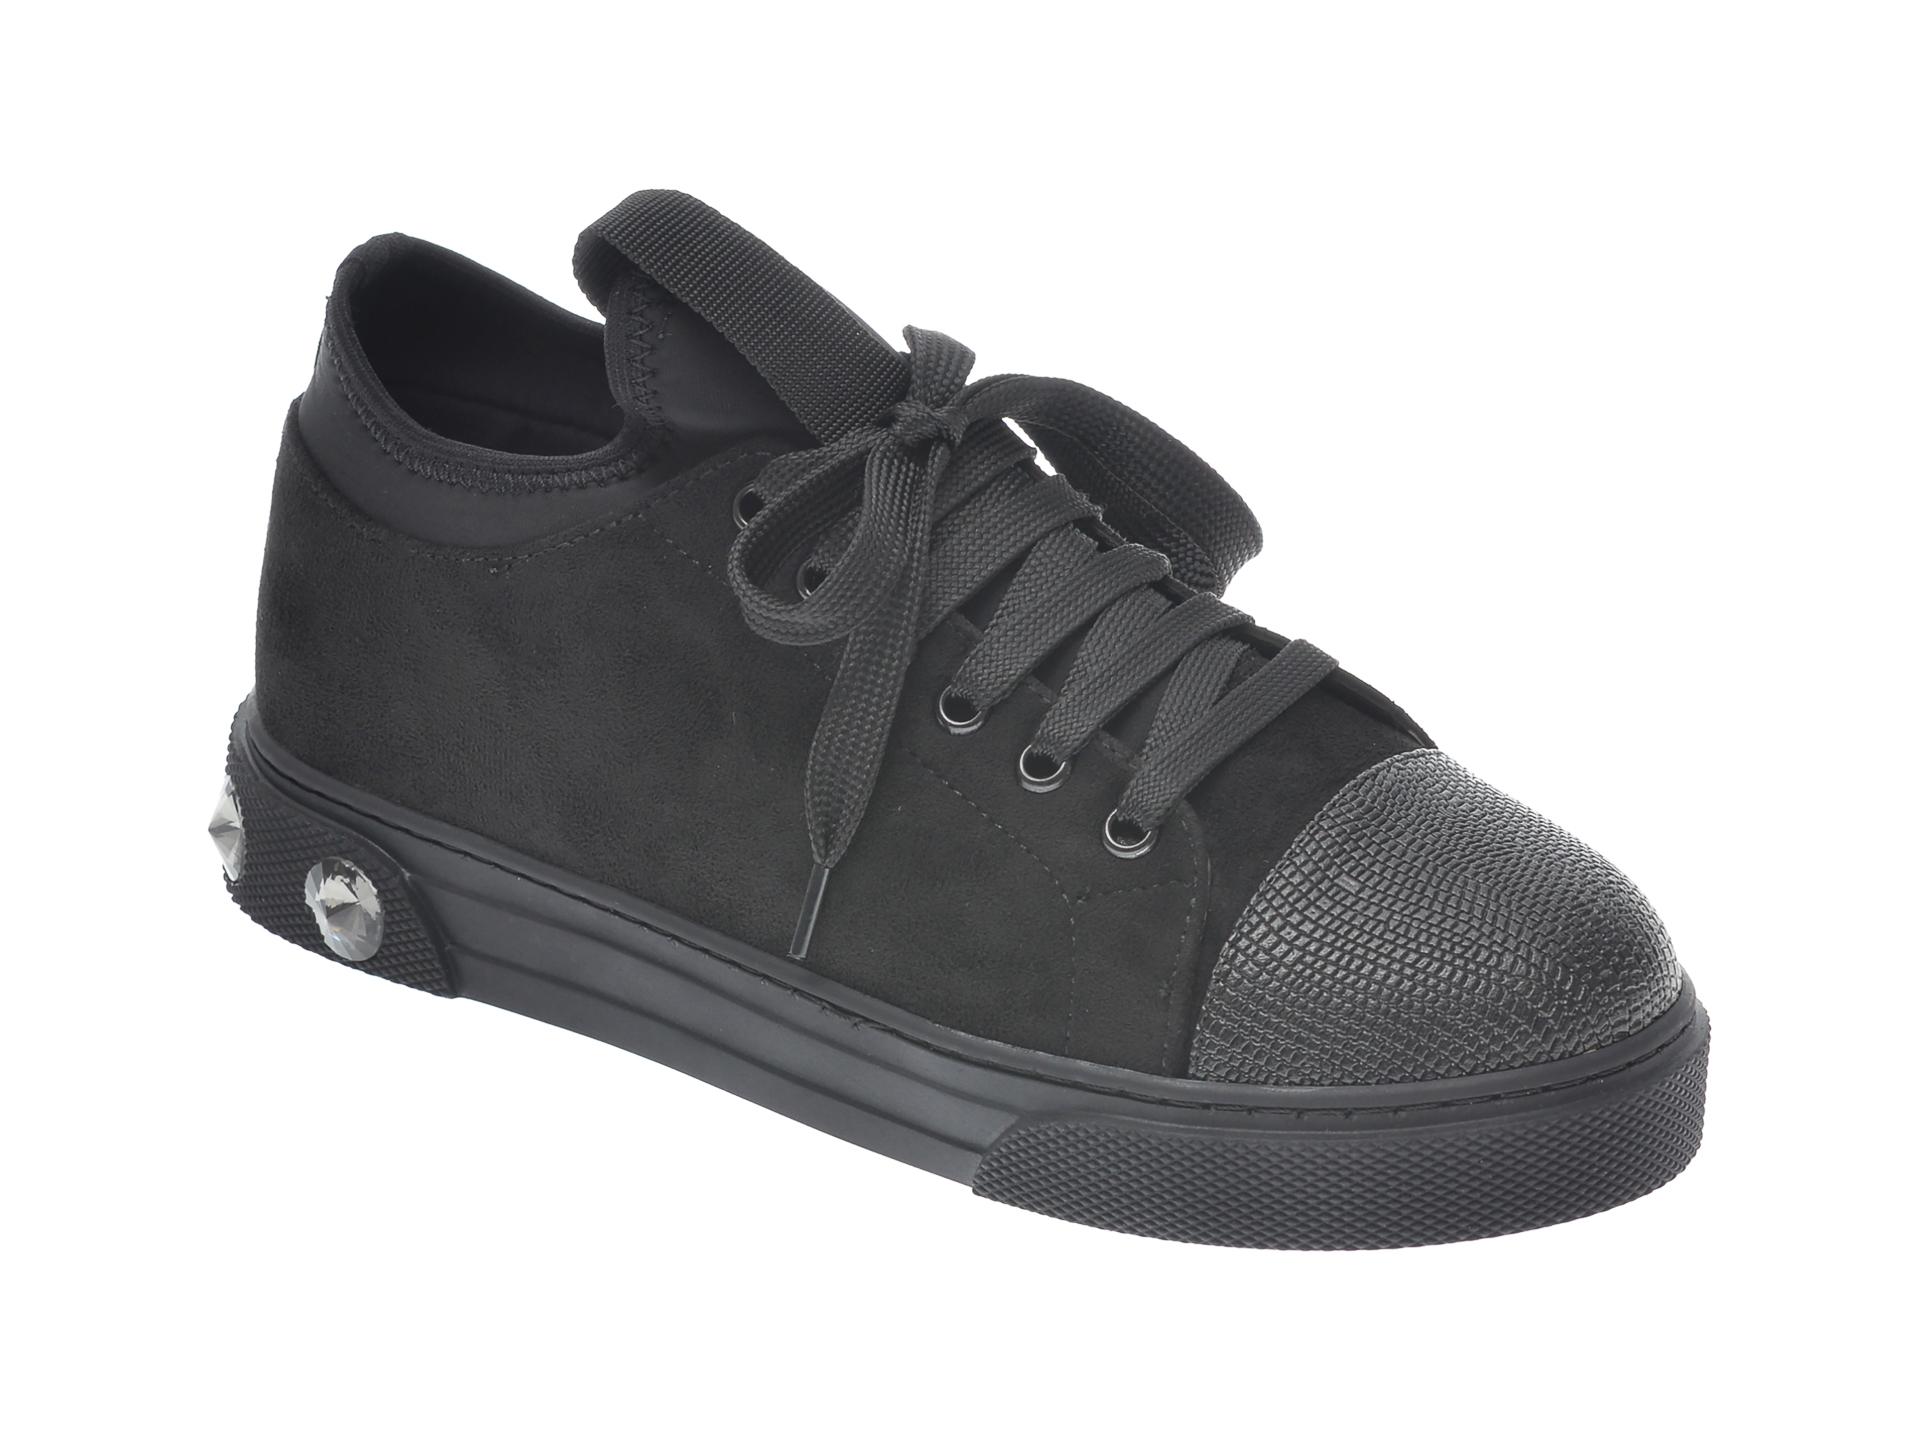 Pantofi Sport Gryxx Negri, T205, Din Material Textil Si Piele Ecologica